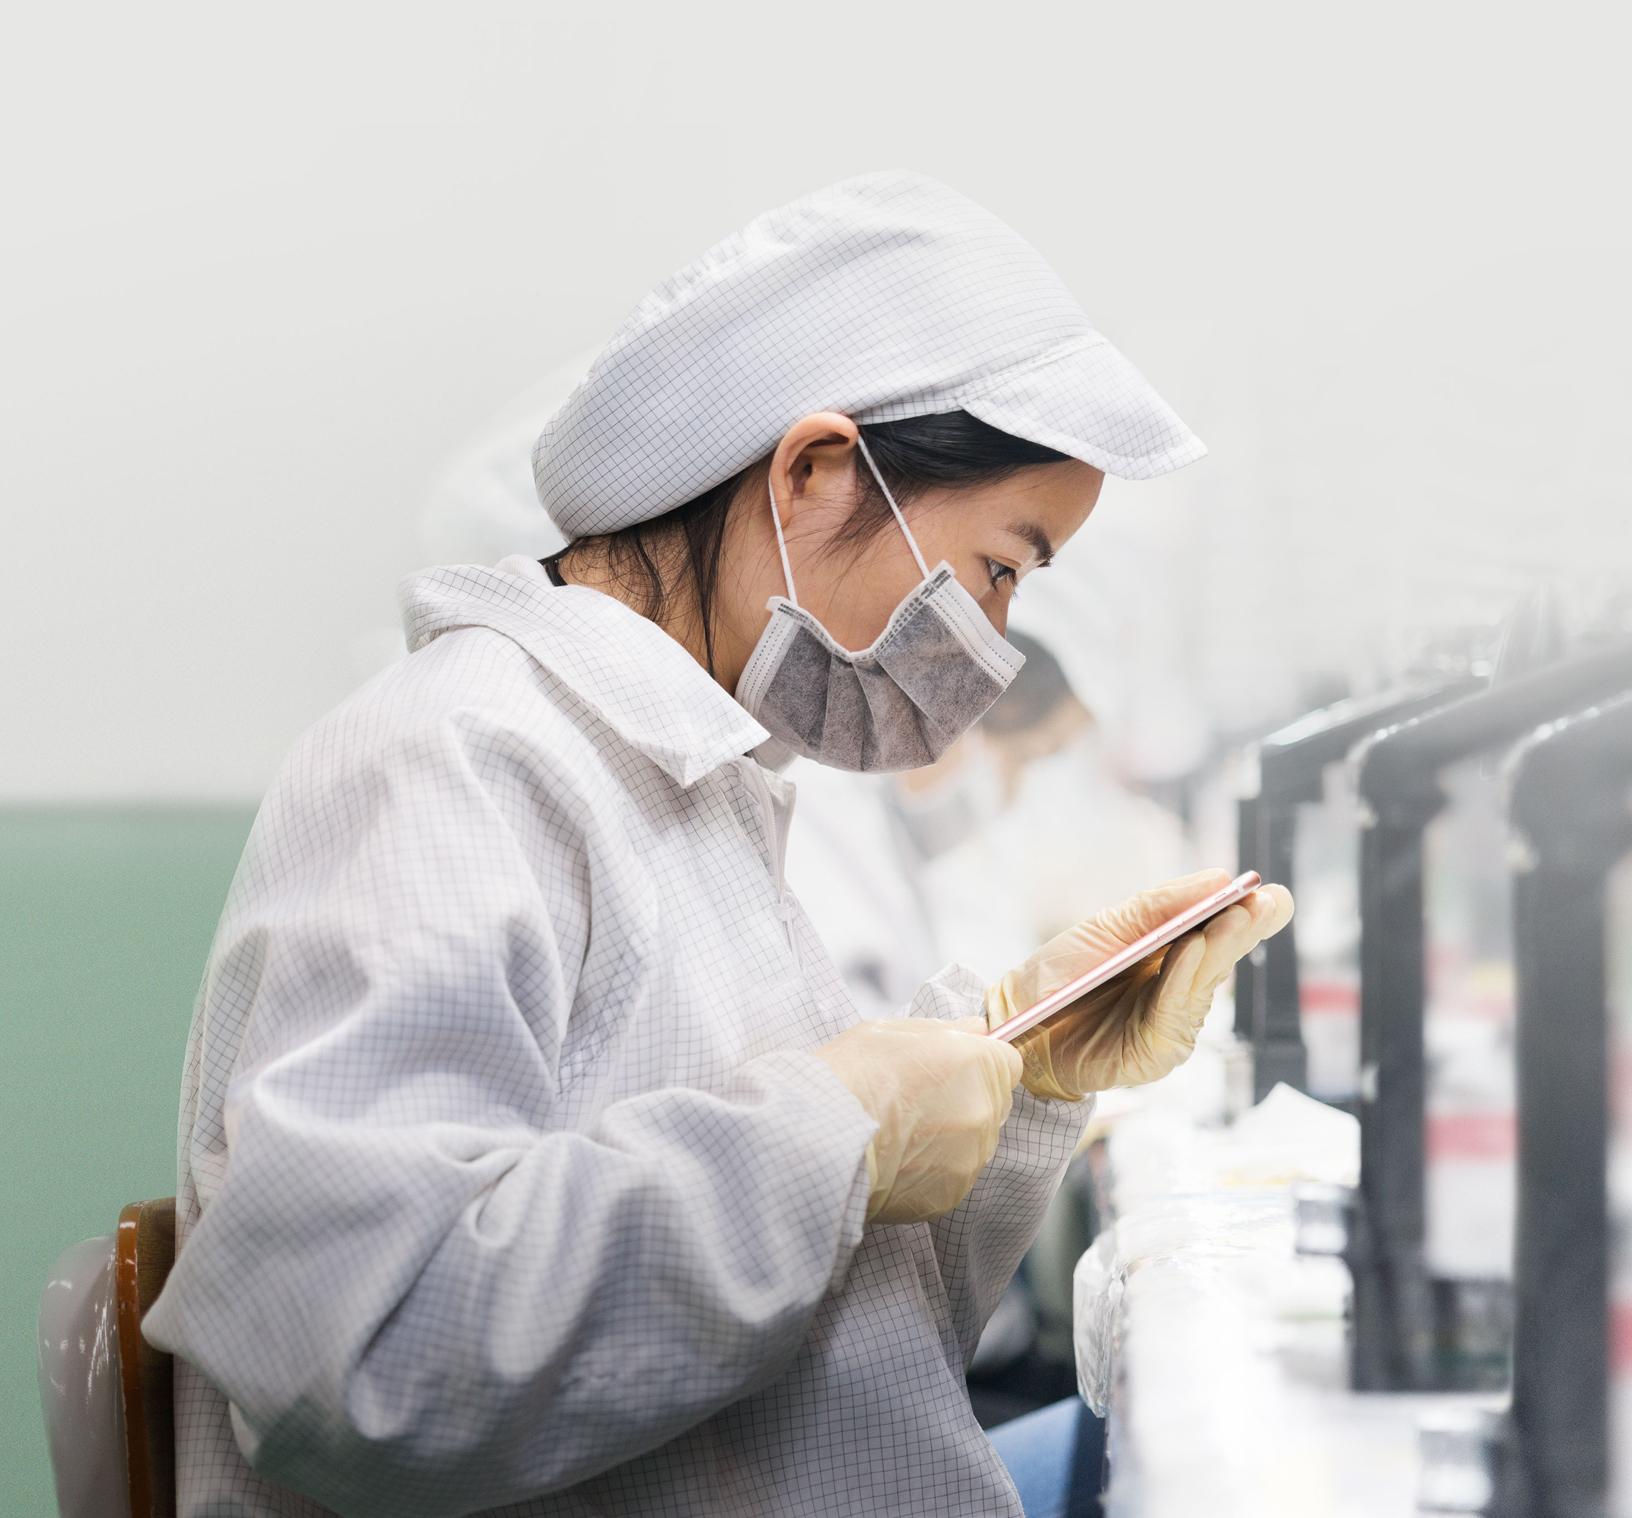 Apple triples supplier sites enrolled in energy efficiency programme